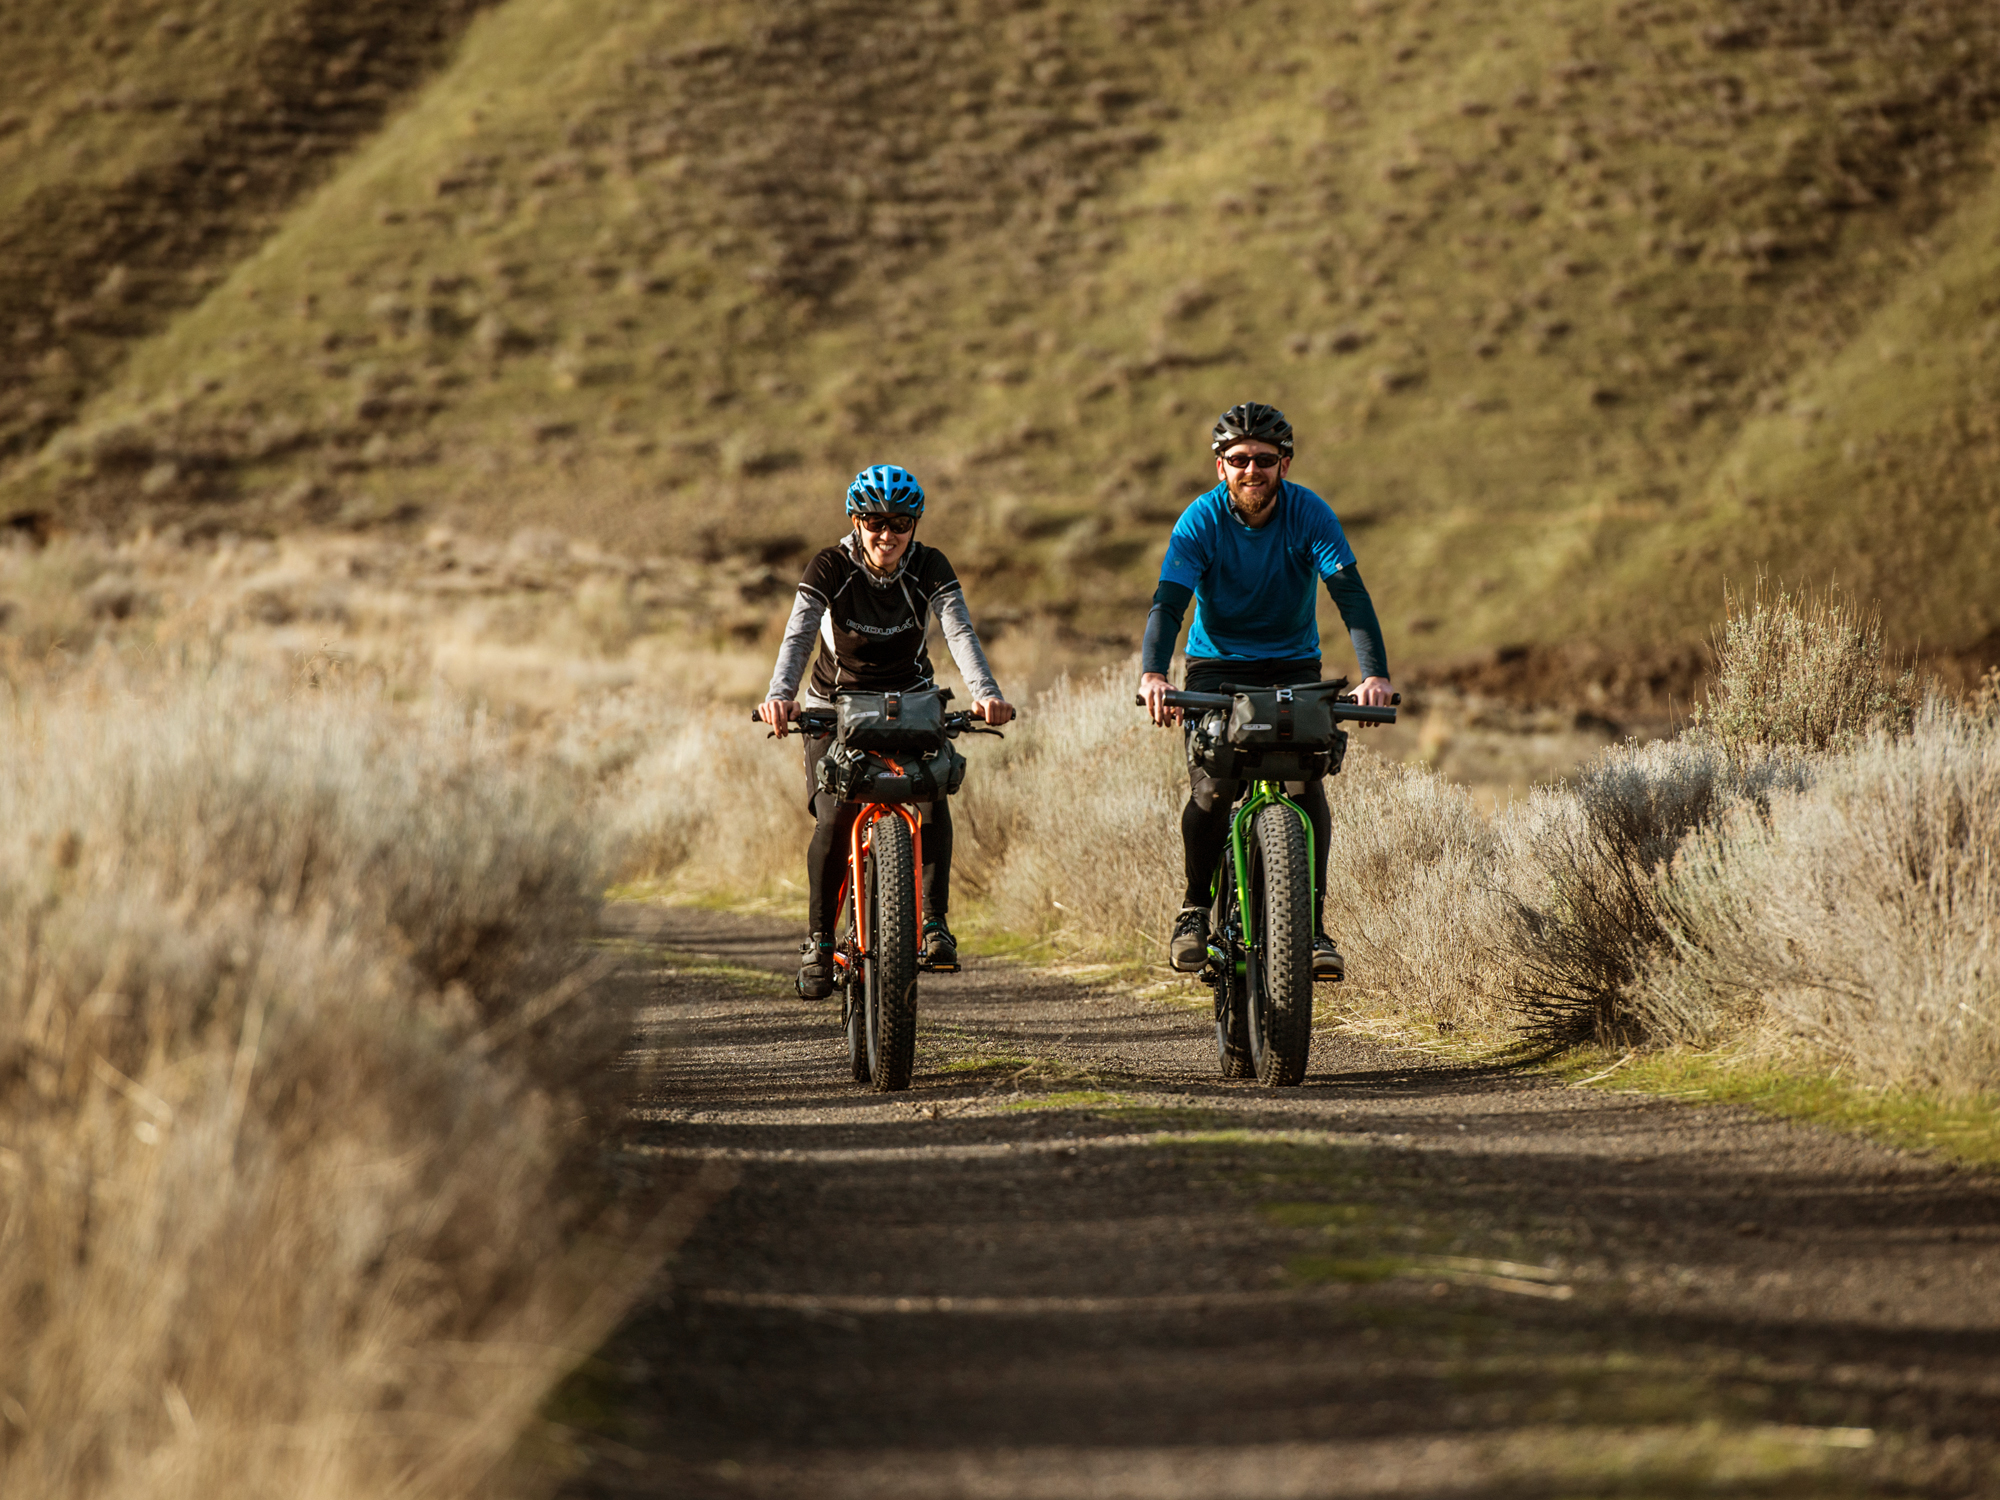 Two riders riding KHS 4 Season Fat Tire Bikes